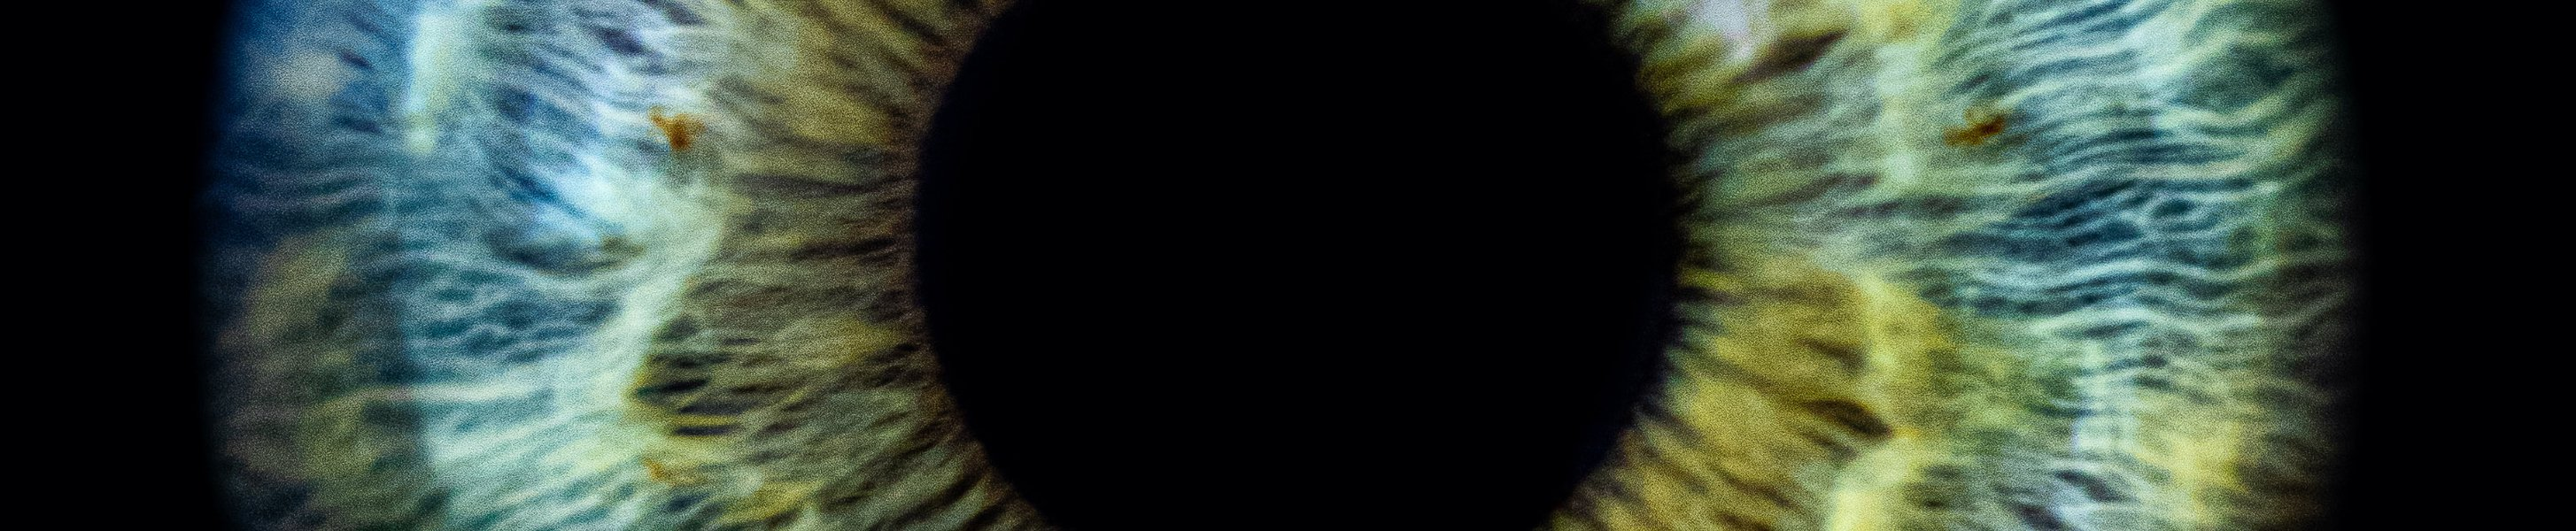 ZEISS Header Image, pupil